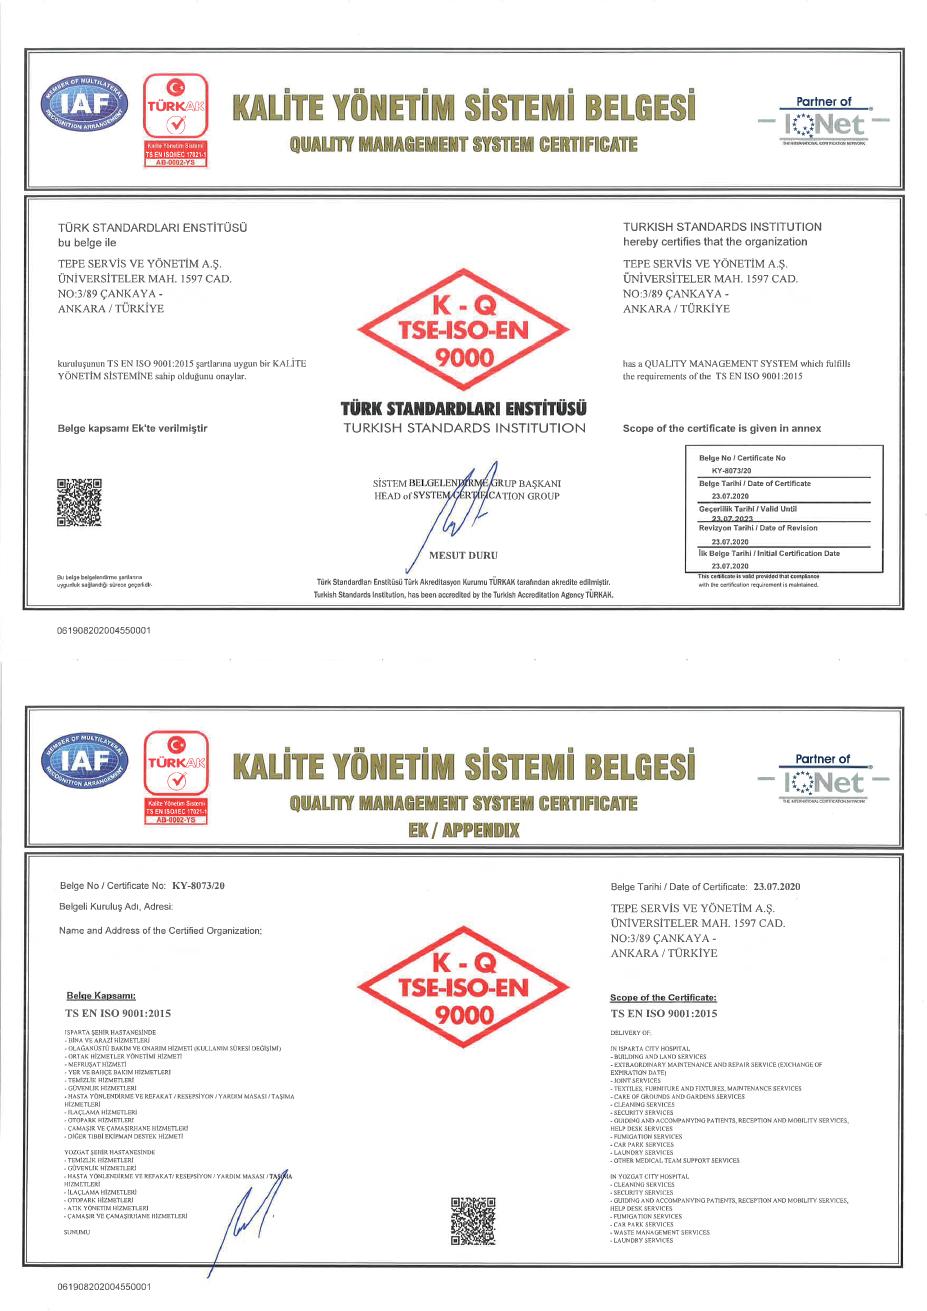 Isparta Şehir Hastanesi PPP Projesi ISO 9001